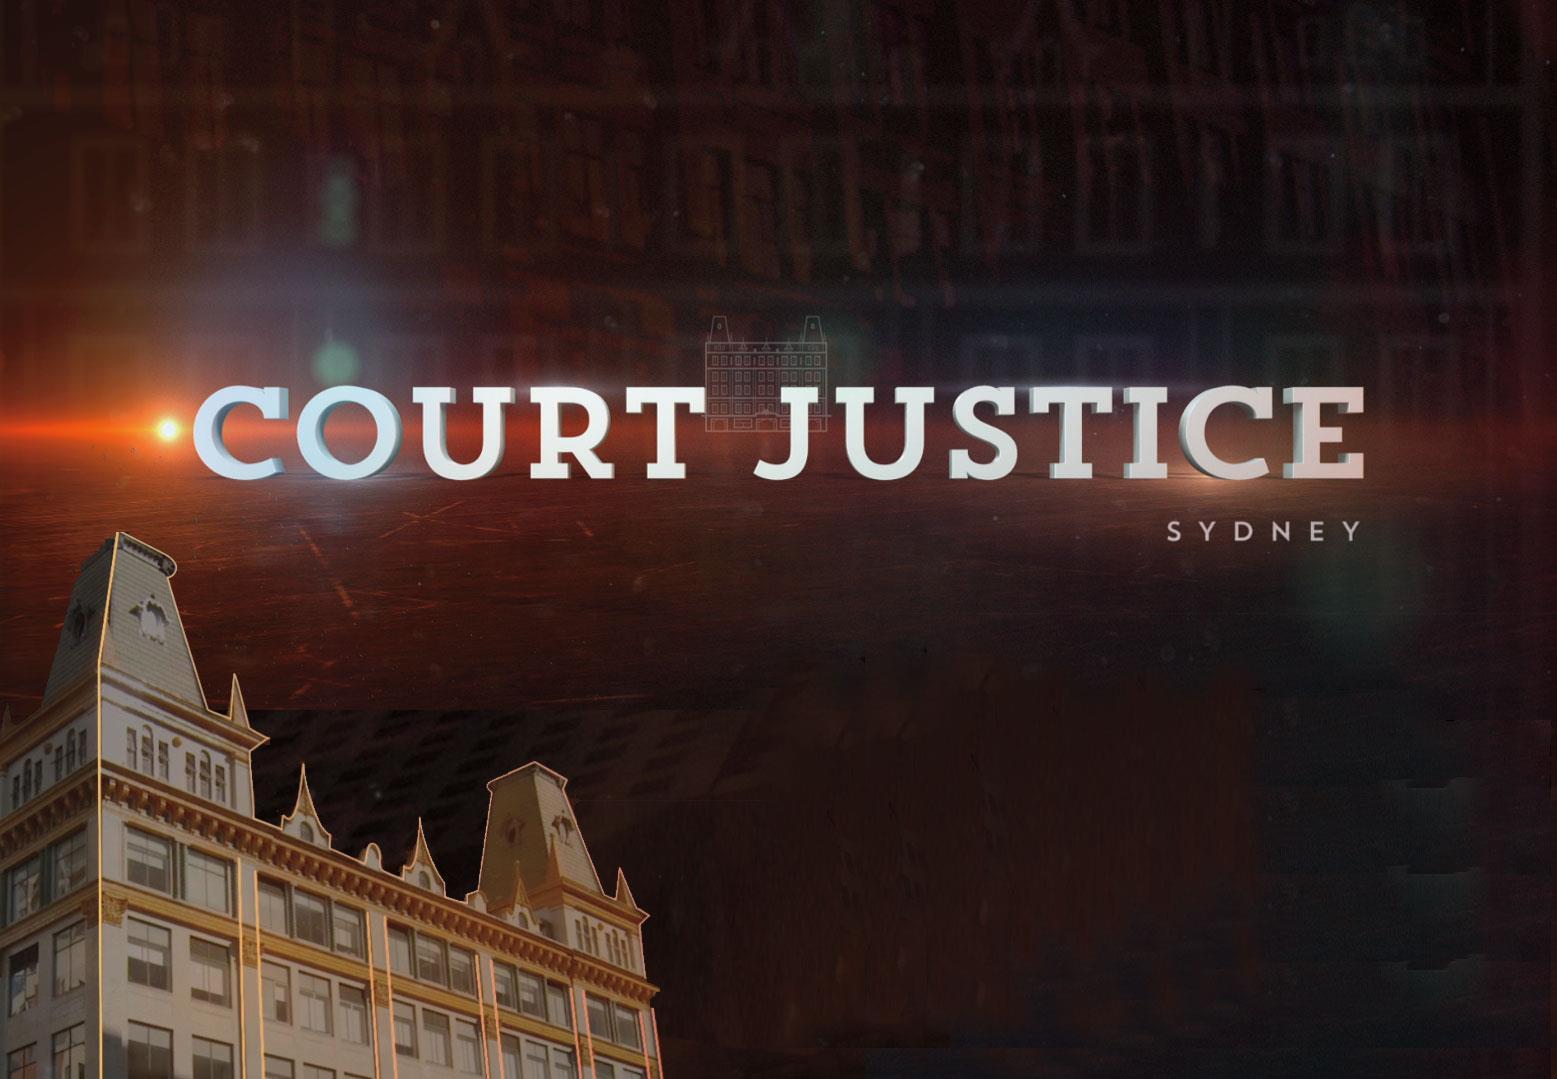 Court Justice: Sydney